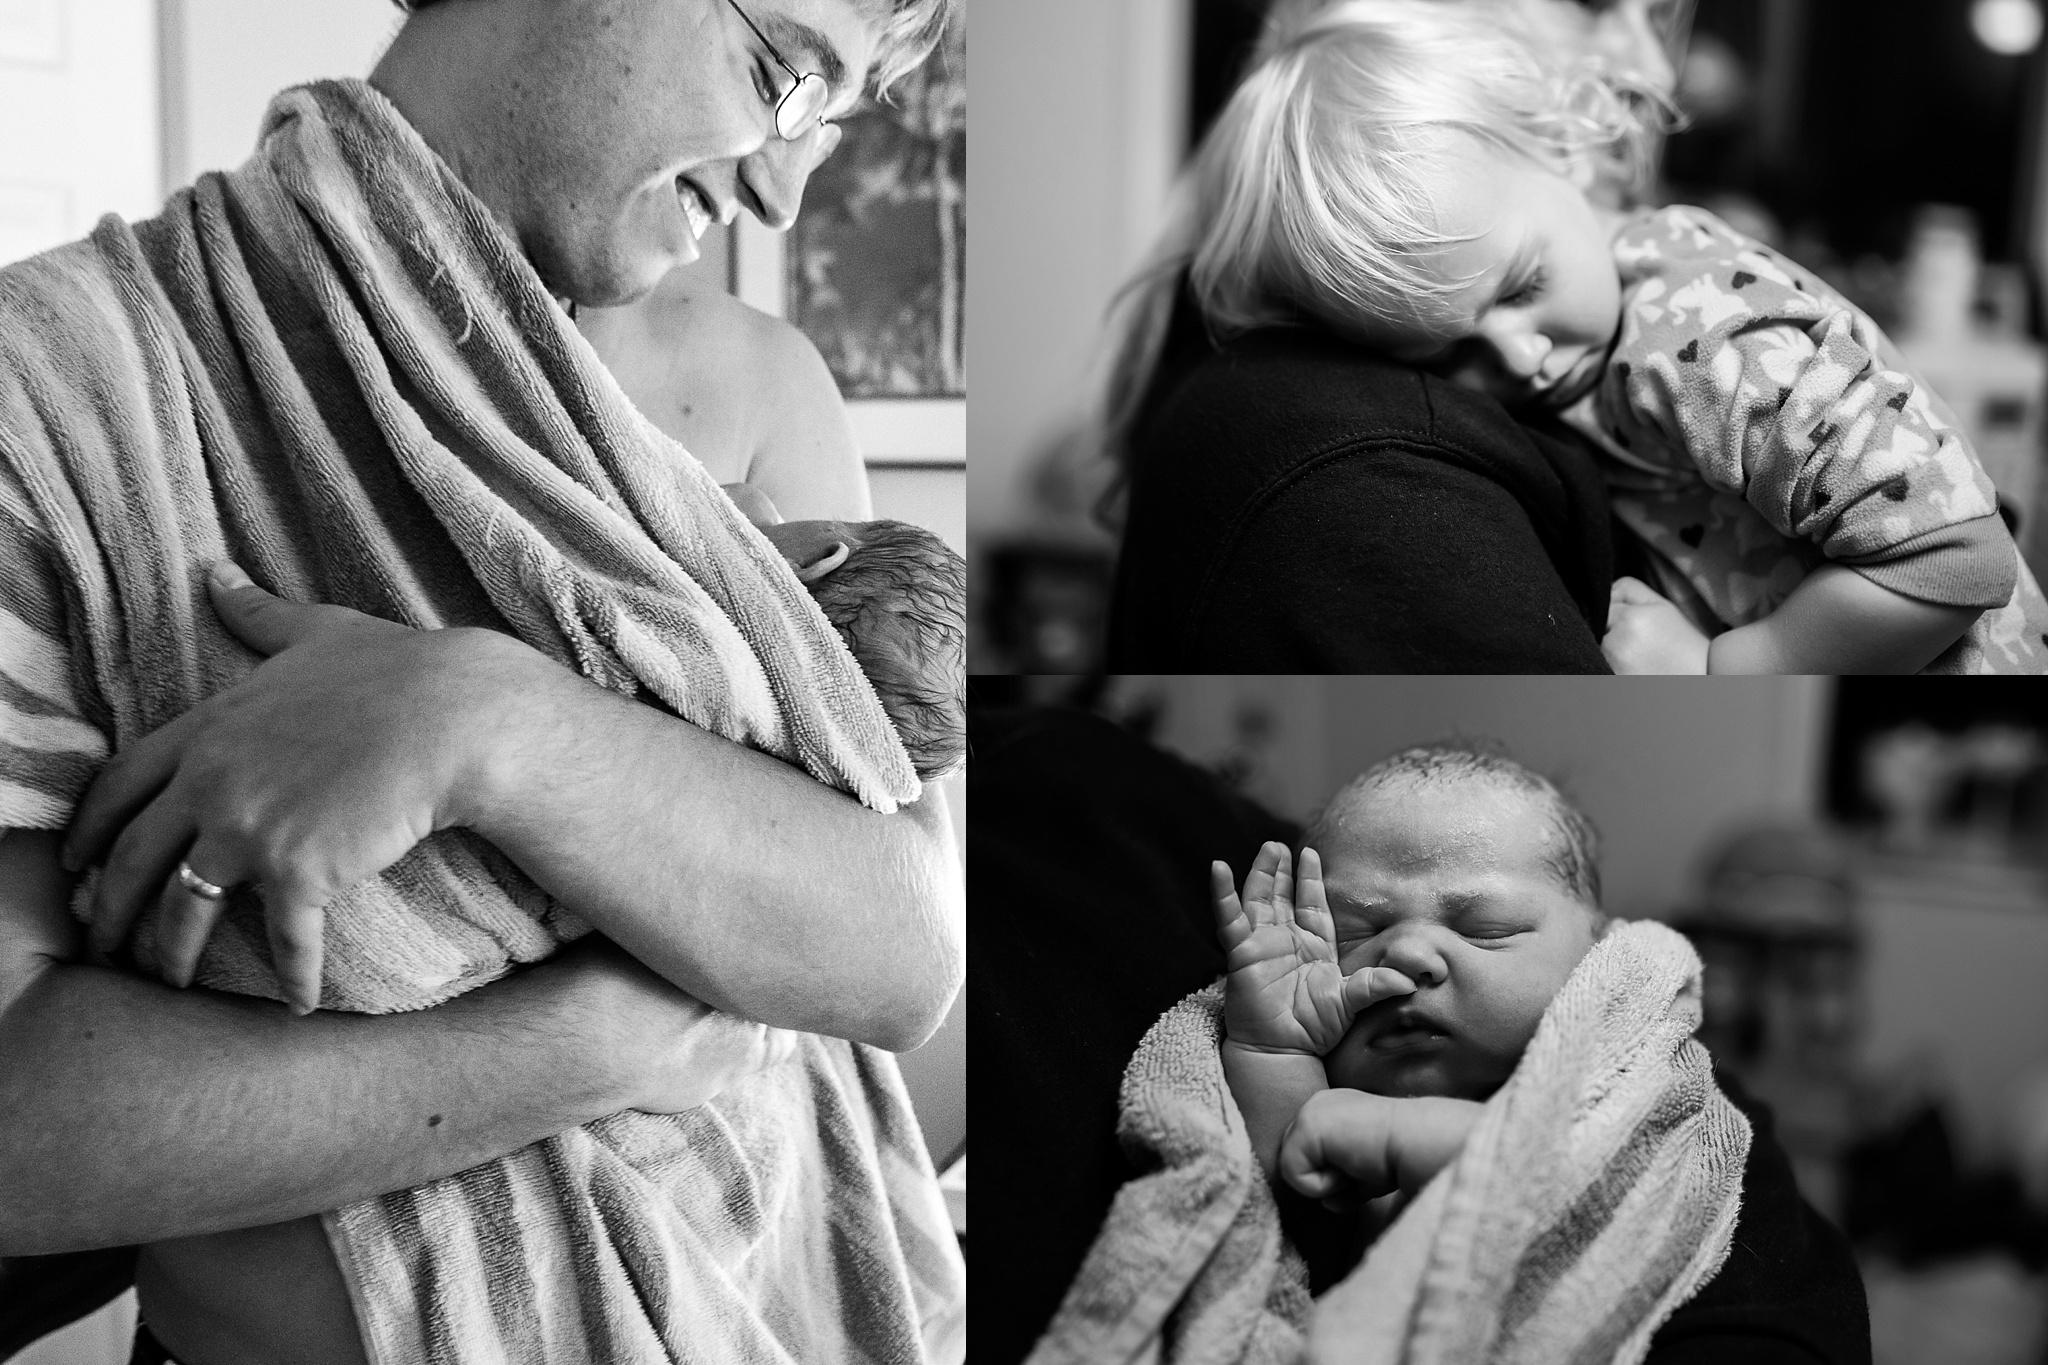 denver-birth-photography-dad-skin-to-skin